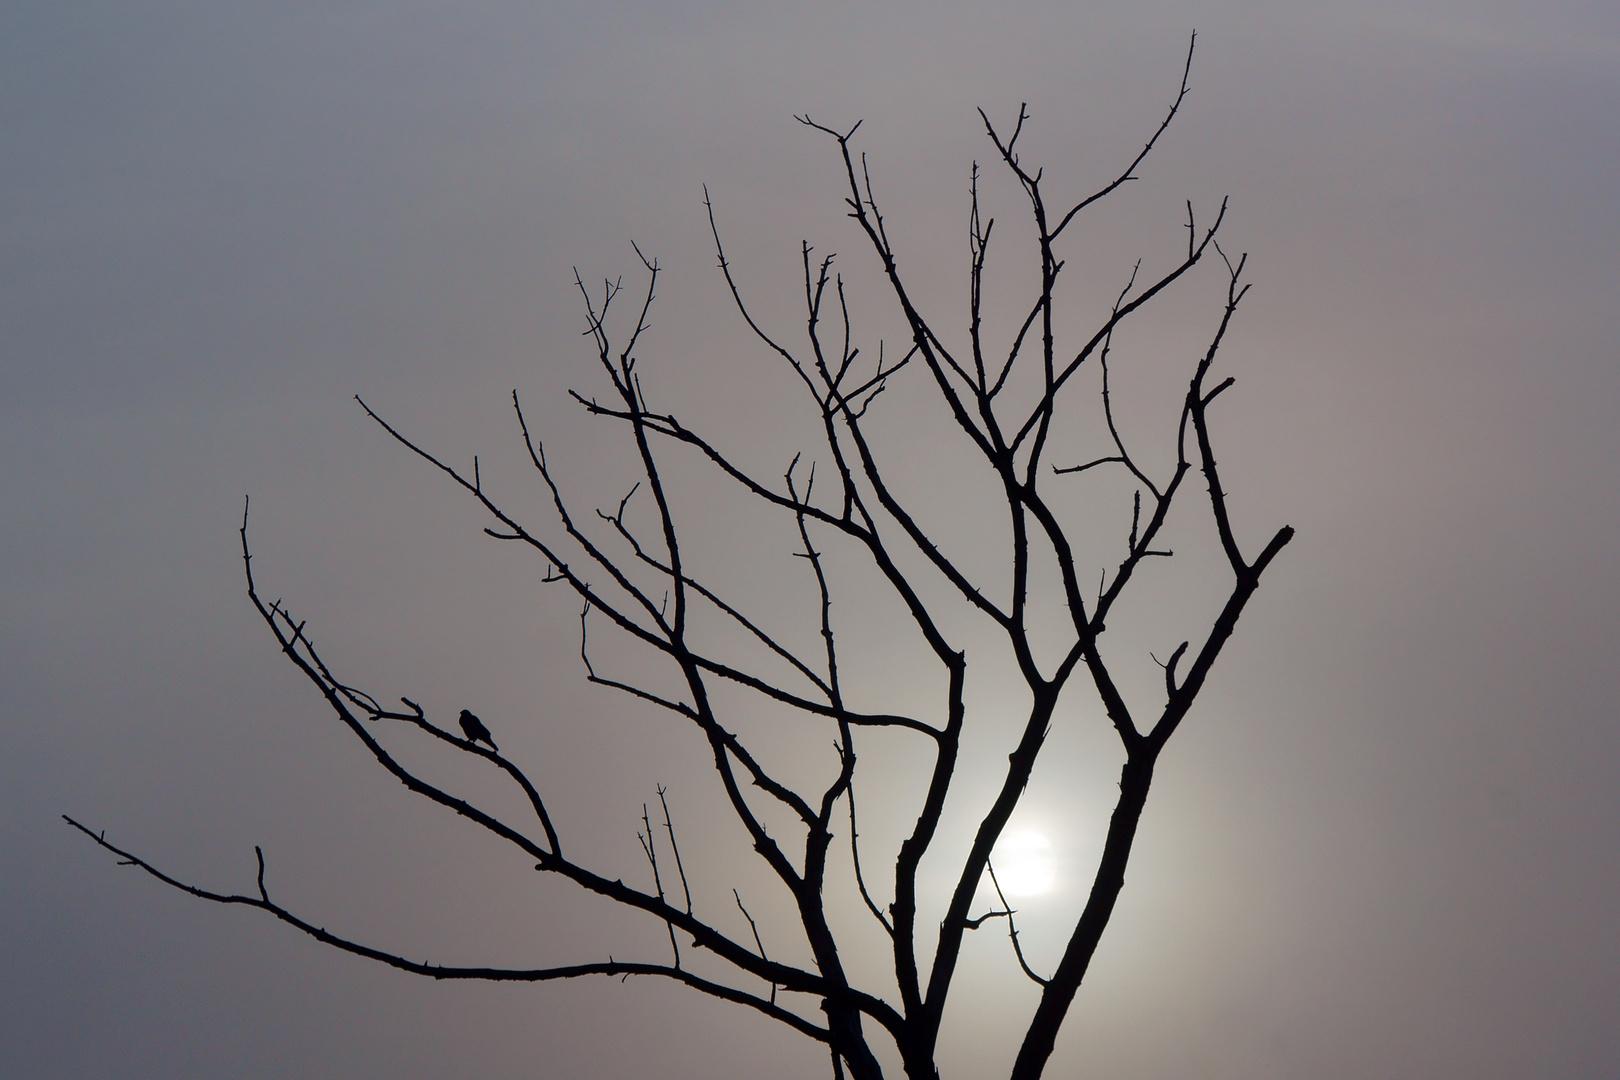 Toter Baum im Nebel